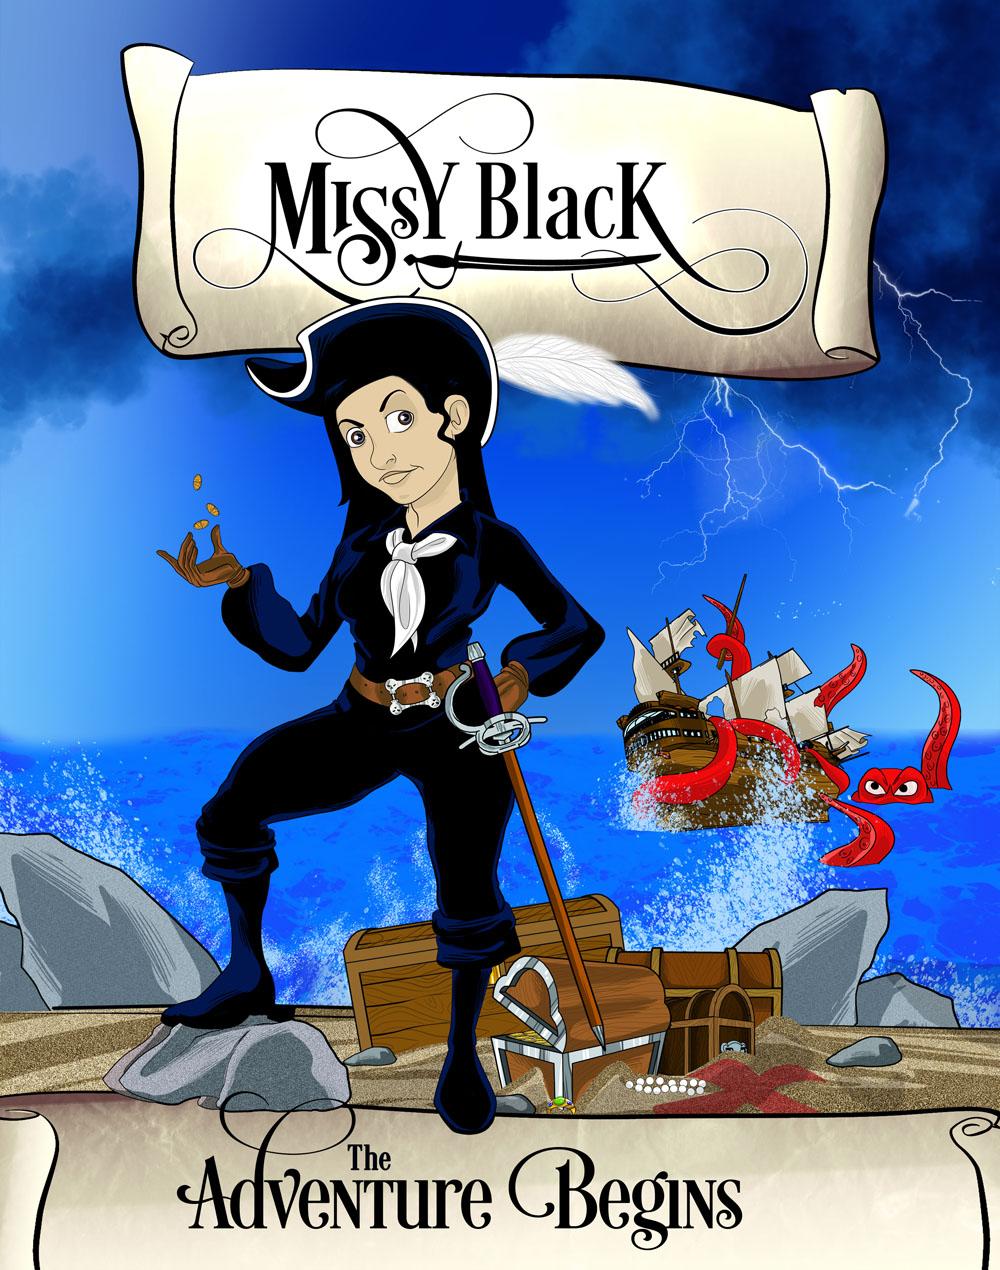 Poster Design for Children's Missy Black Illustrated Book